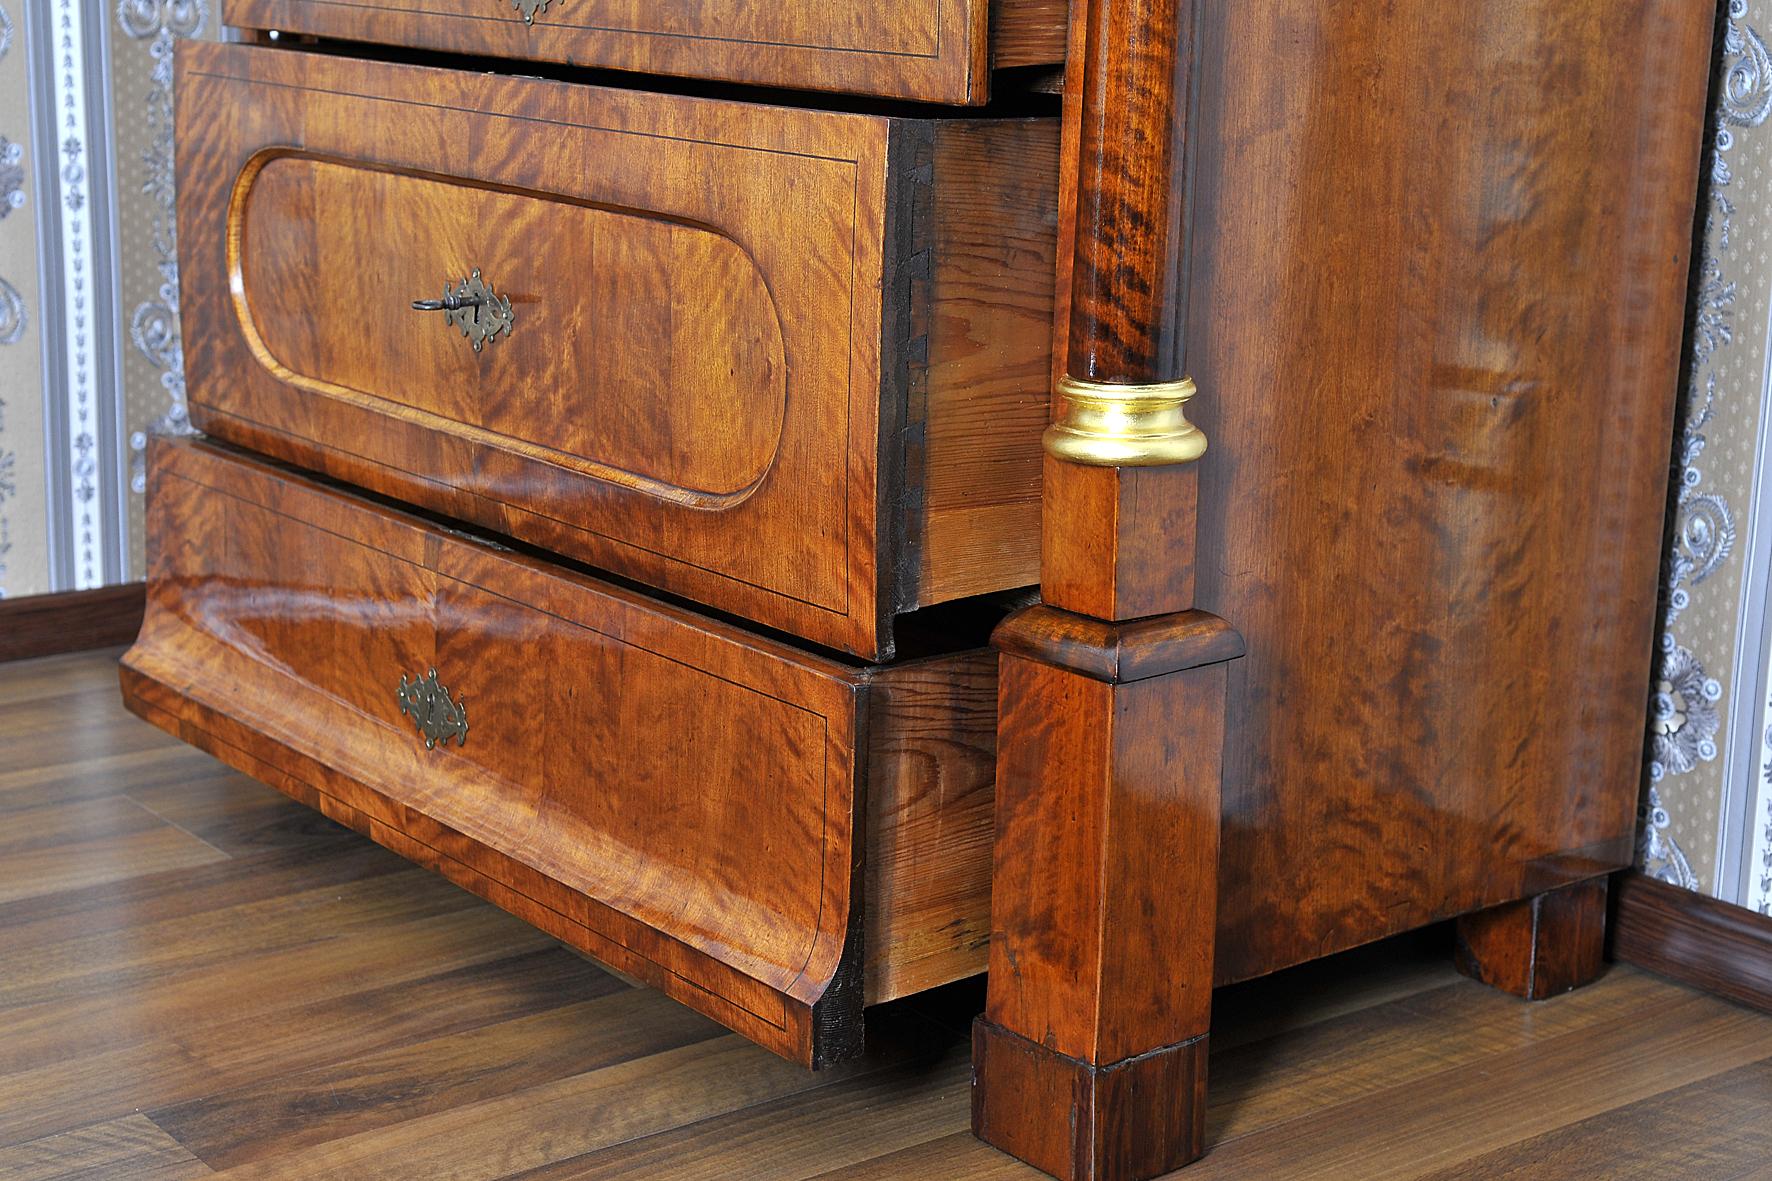 biedermeier secretary berlin 1825 for sale classifieds. Black Bedroom Furniture Sets. Home Design Ideas